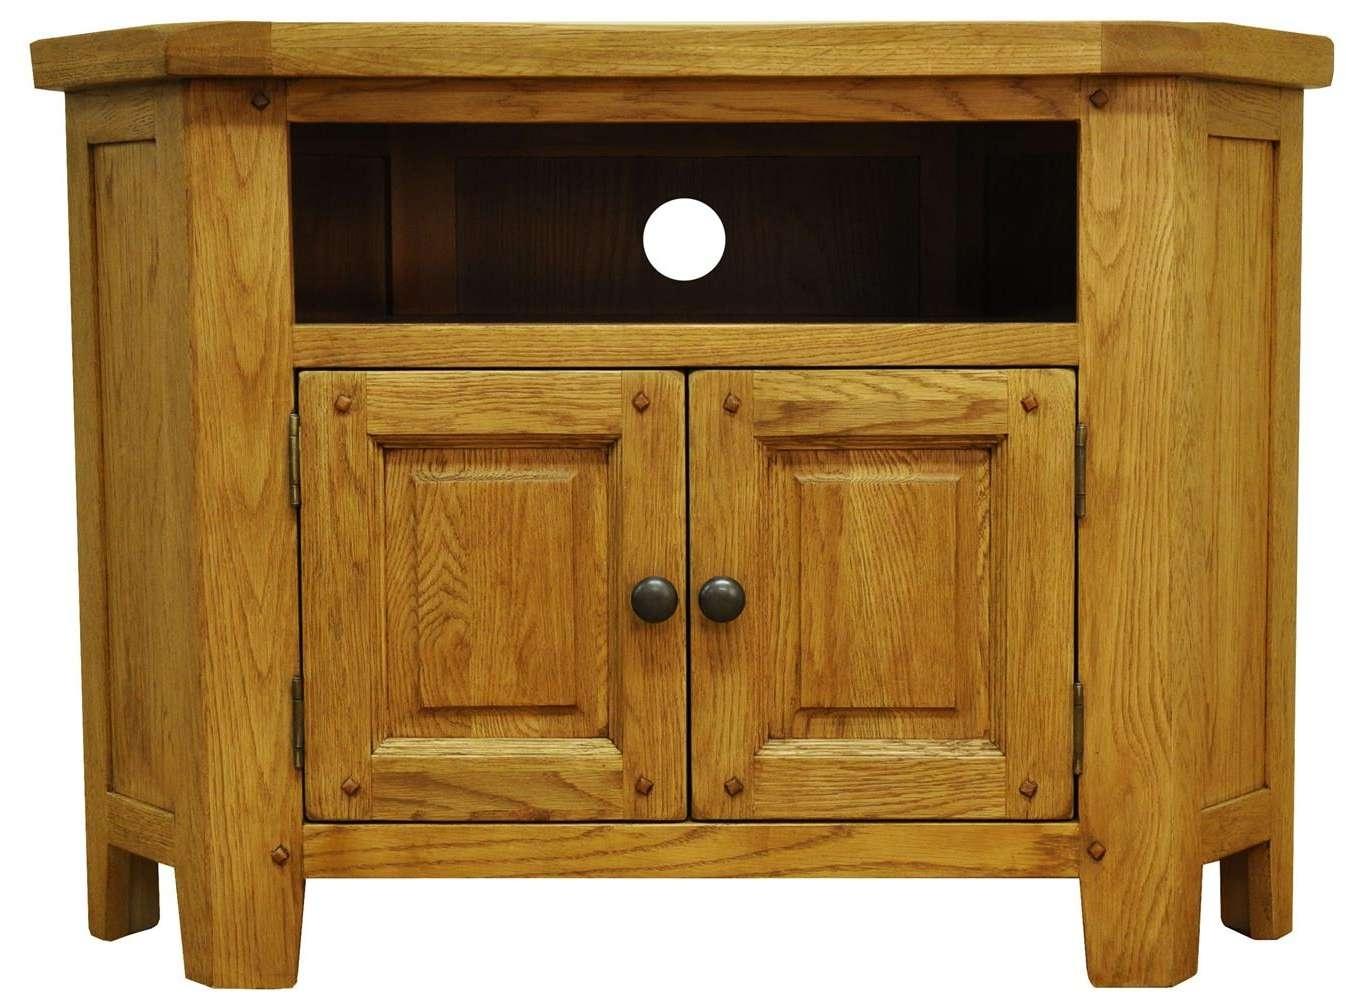 Tv Cabinets : Stanton Rustic Oak Corner Tv Unitstanton Rustic Oak With Dark Wood Corner Tv Cabinets (View 17 of 20)